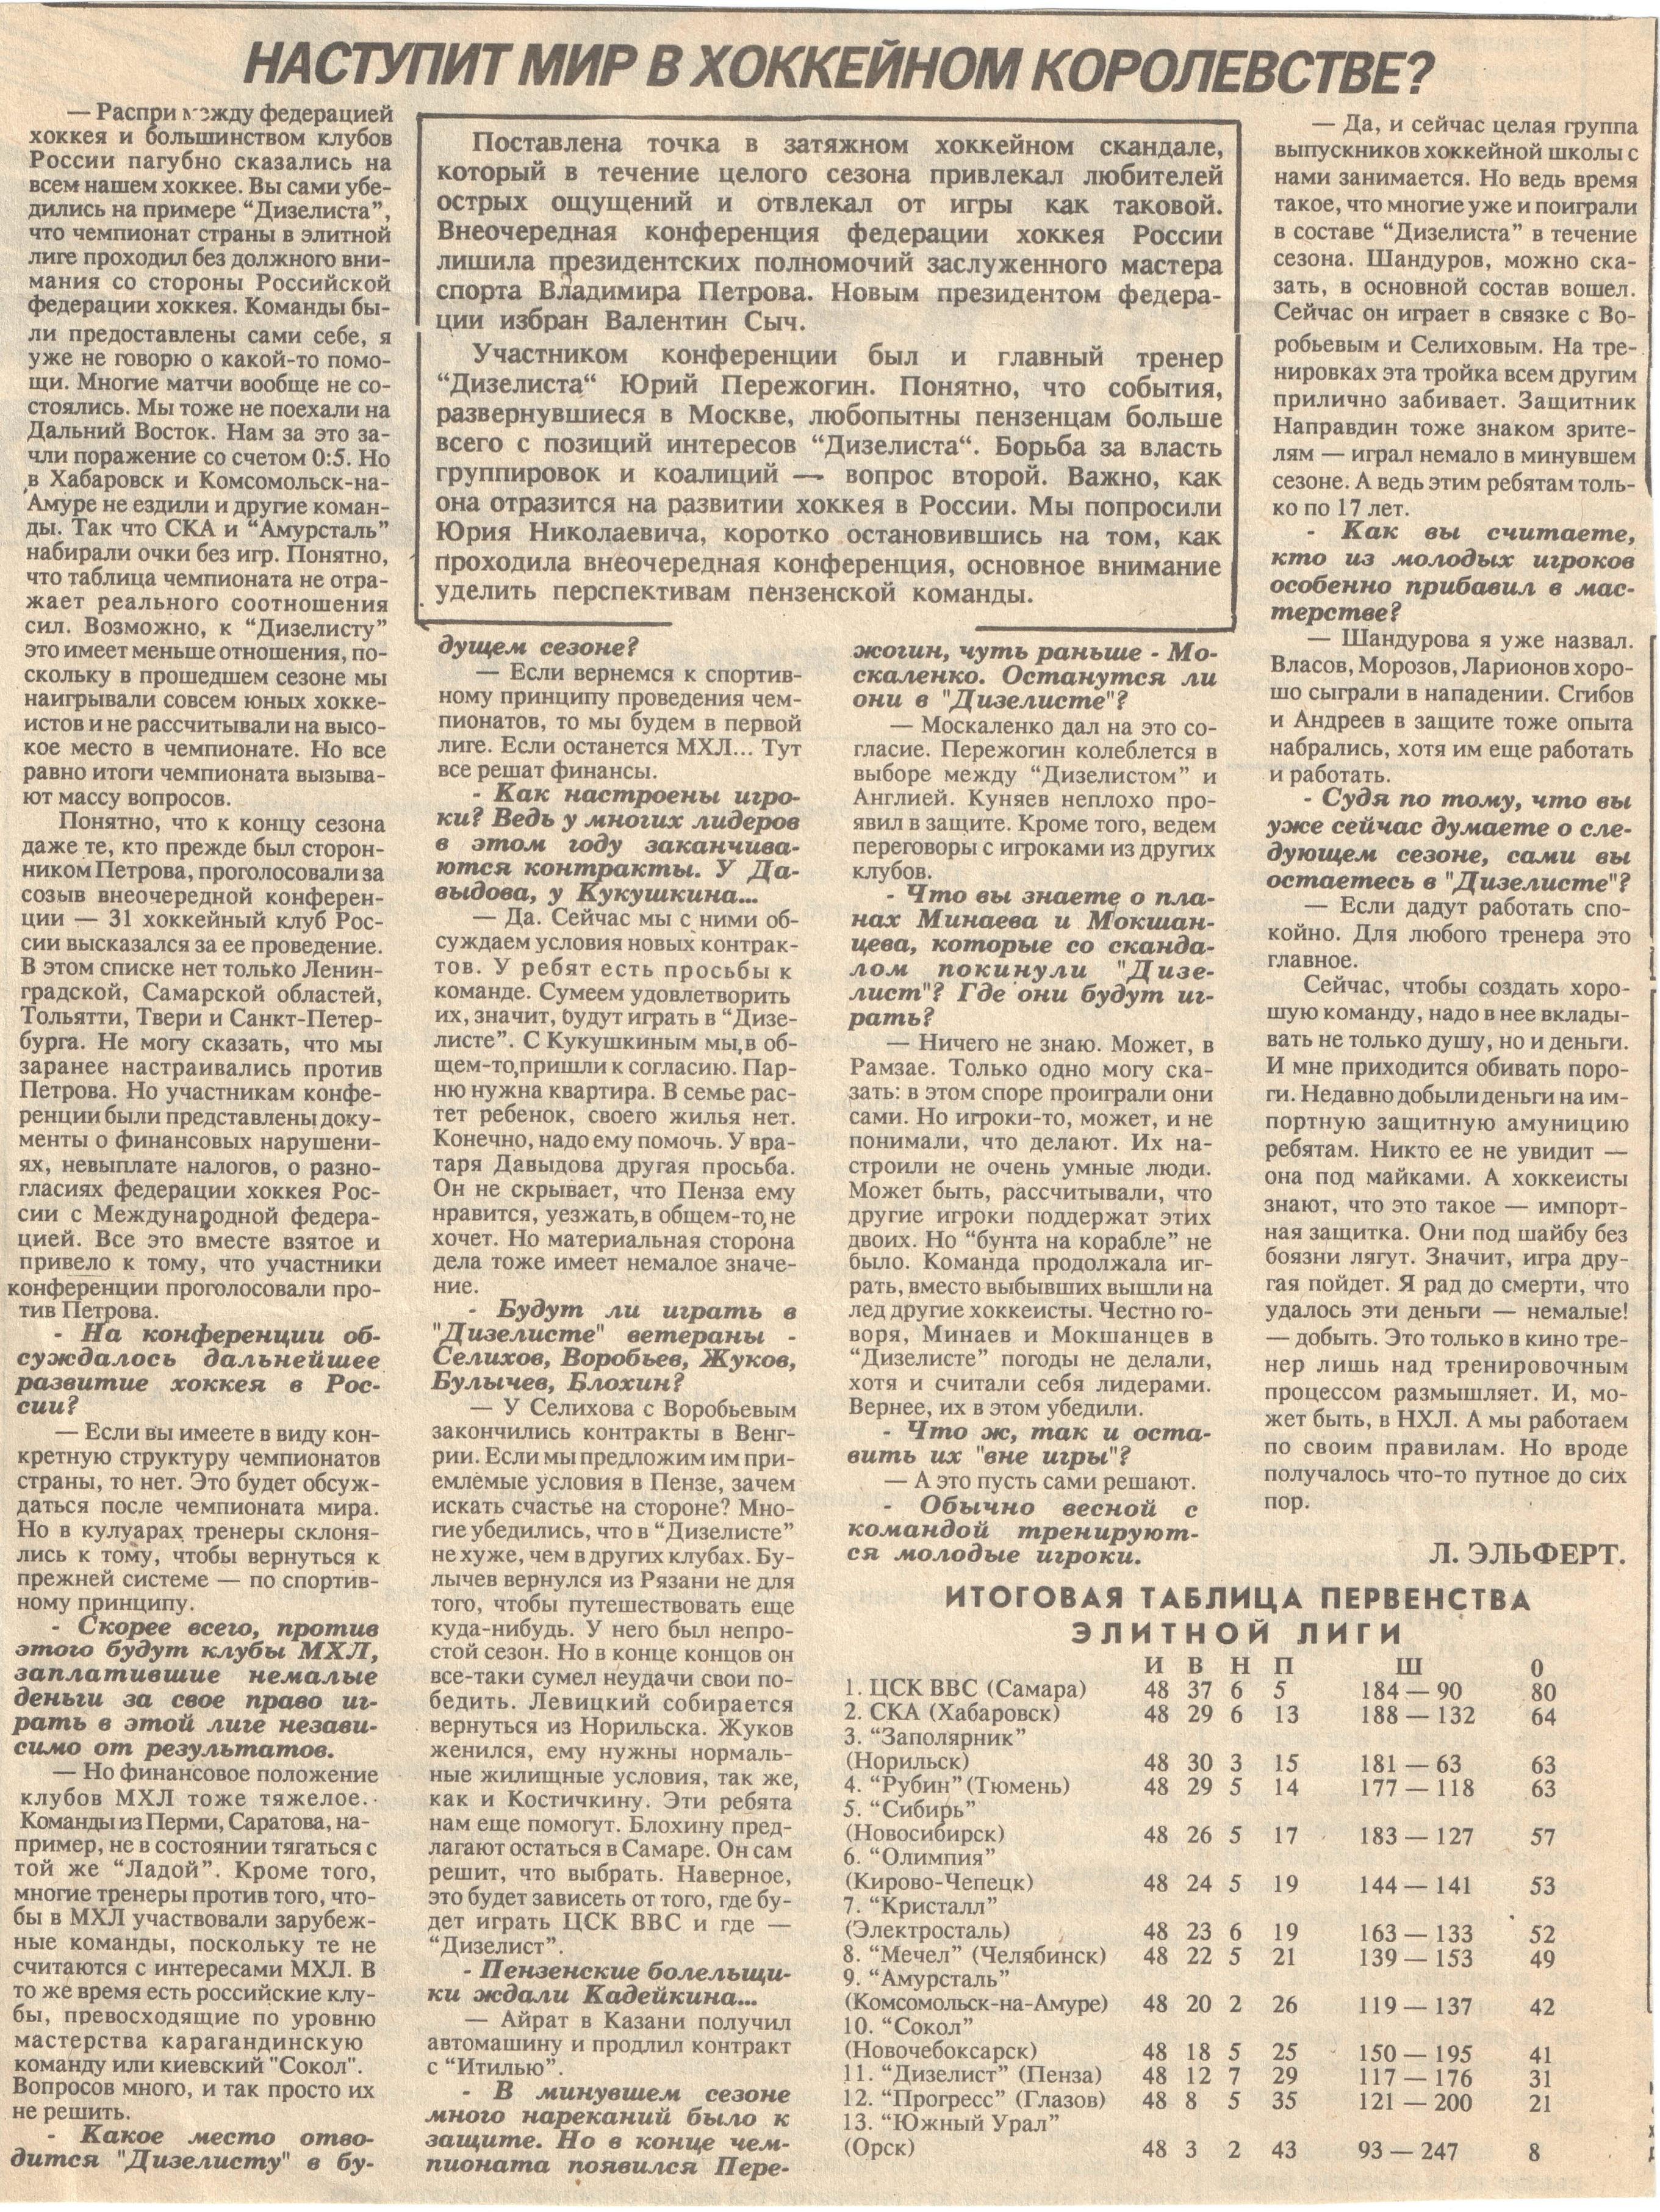 1993-94 итоги.jpg